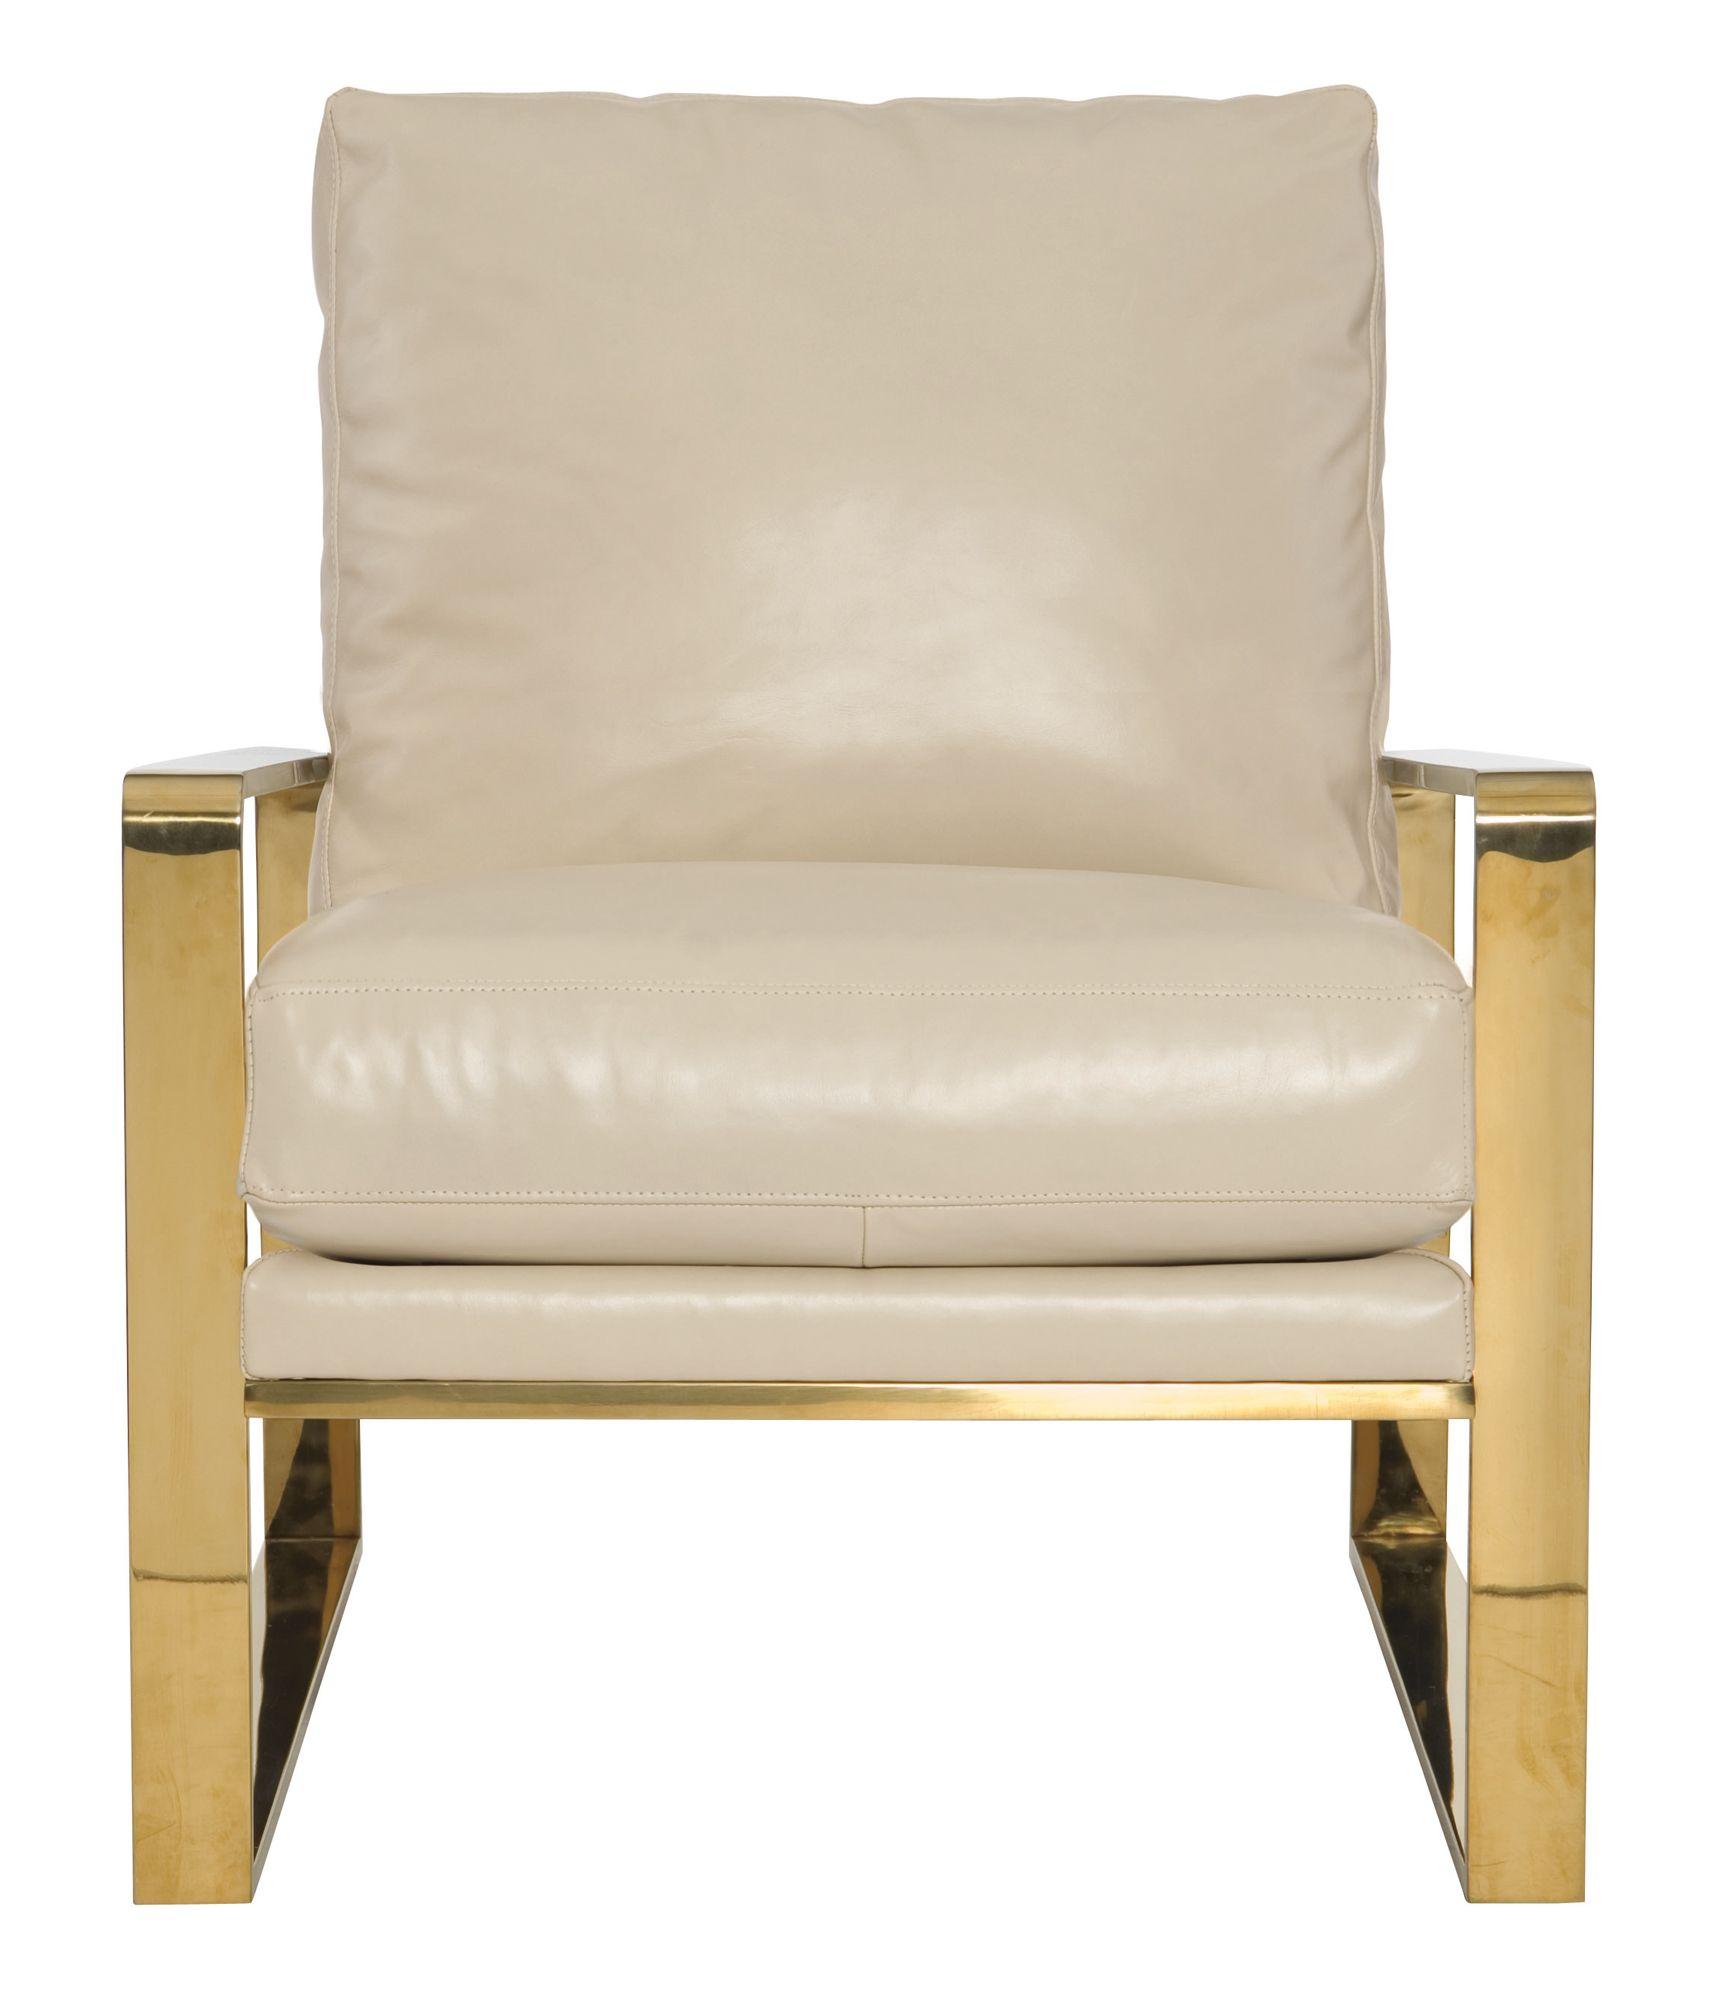 Dorwin Chair | Bernhardt N4103 Leather Shown 261 002 Gold #Metal Arm W 29